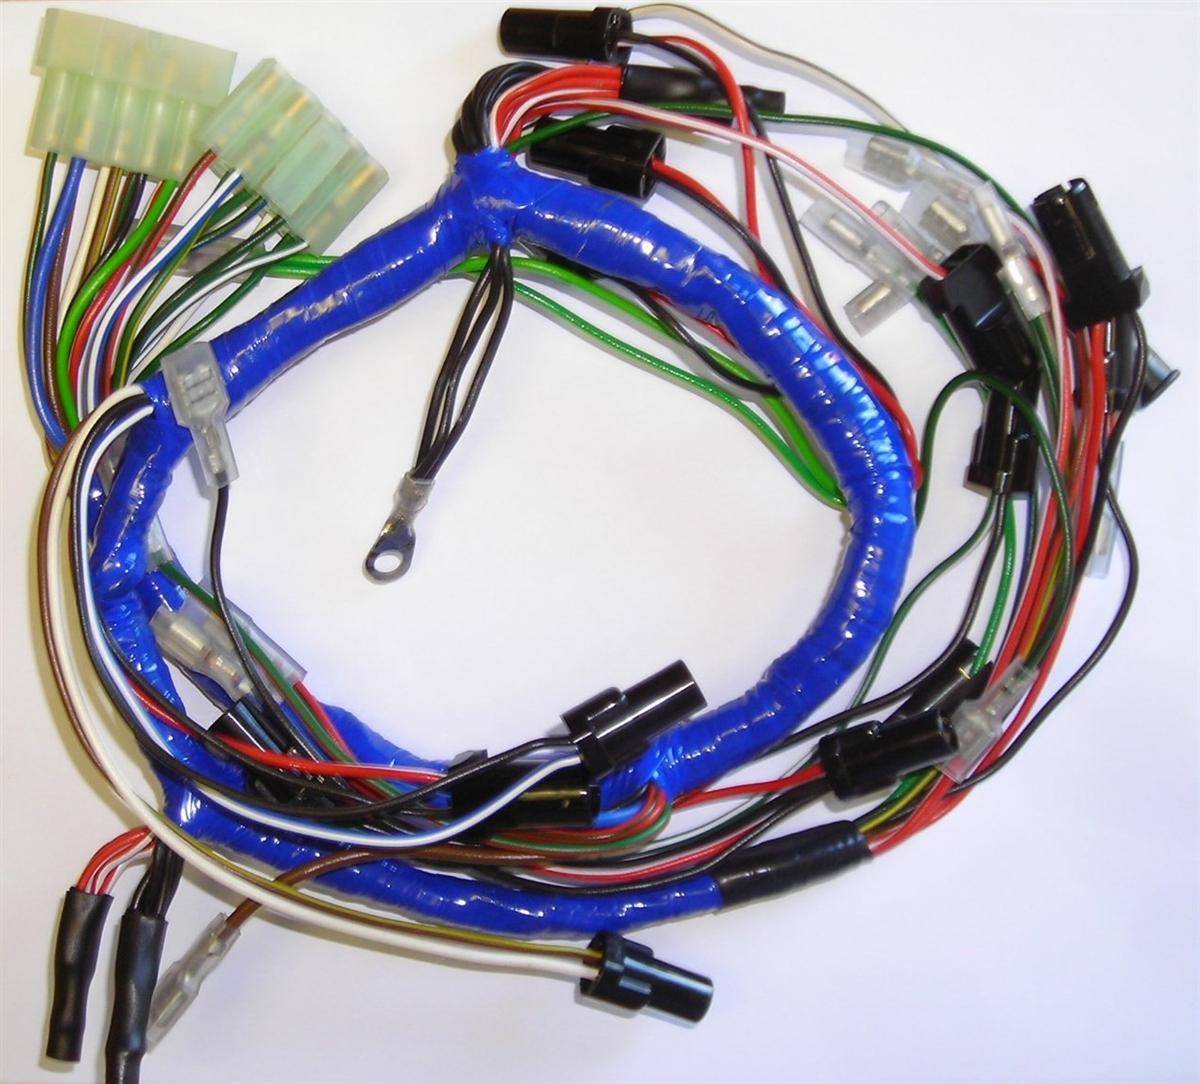 MGB 1975 Dash Wiring Harness (529) Dash Wiring Harness on